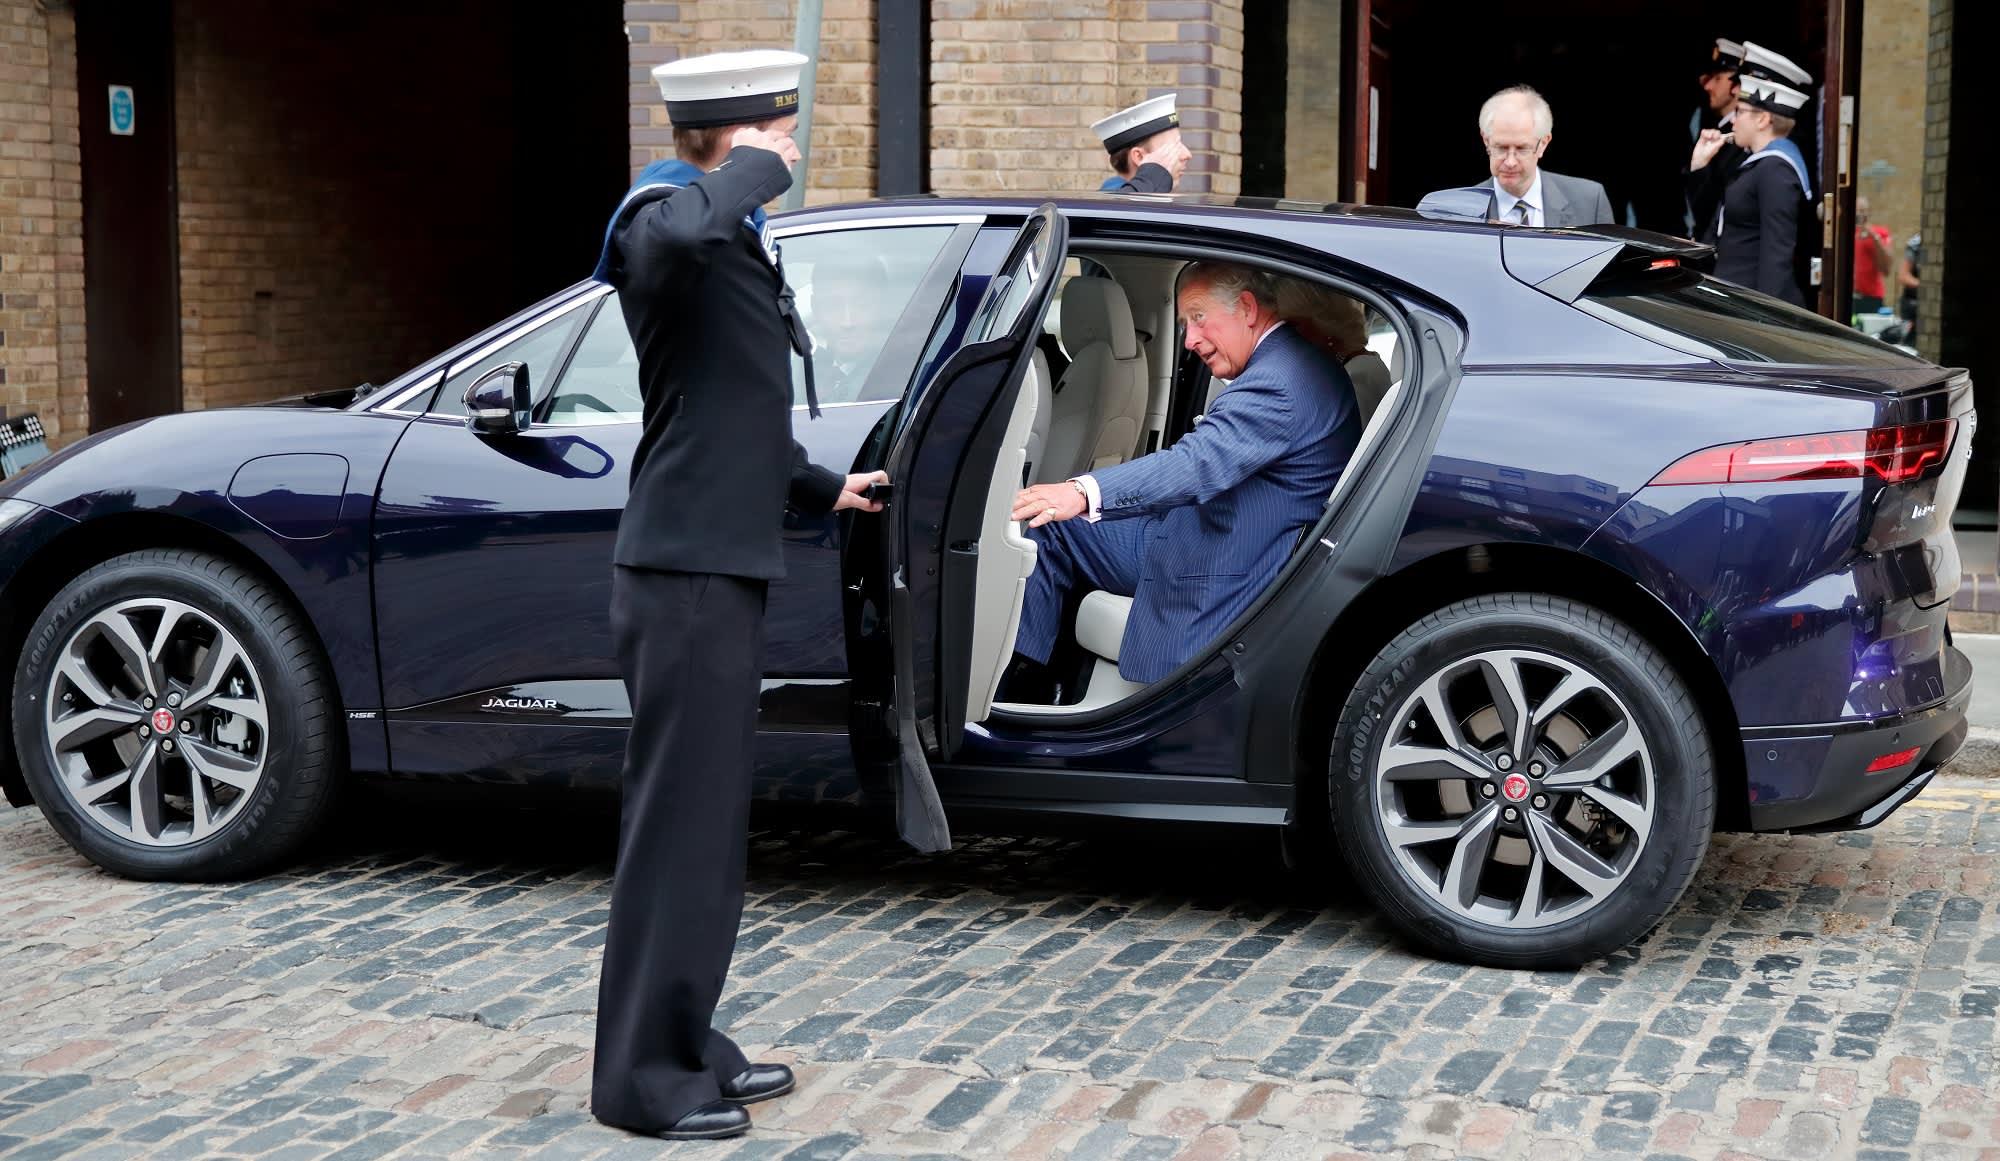 GP: Jaguar I Pace / Prince Charles